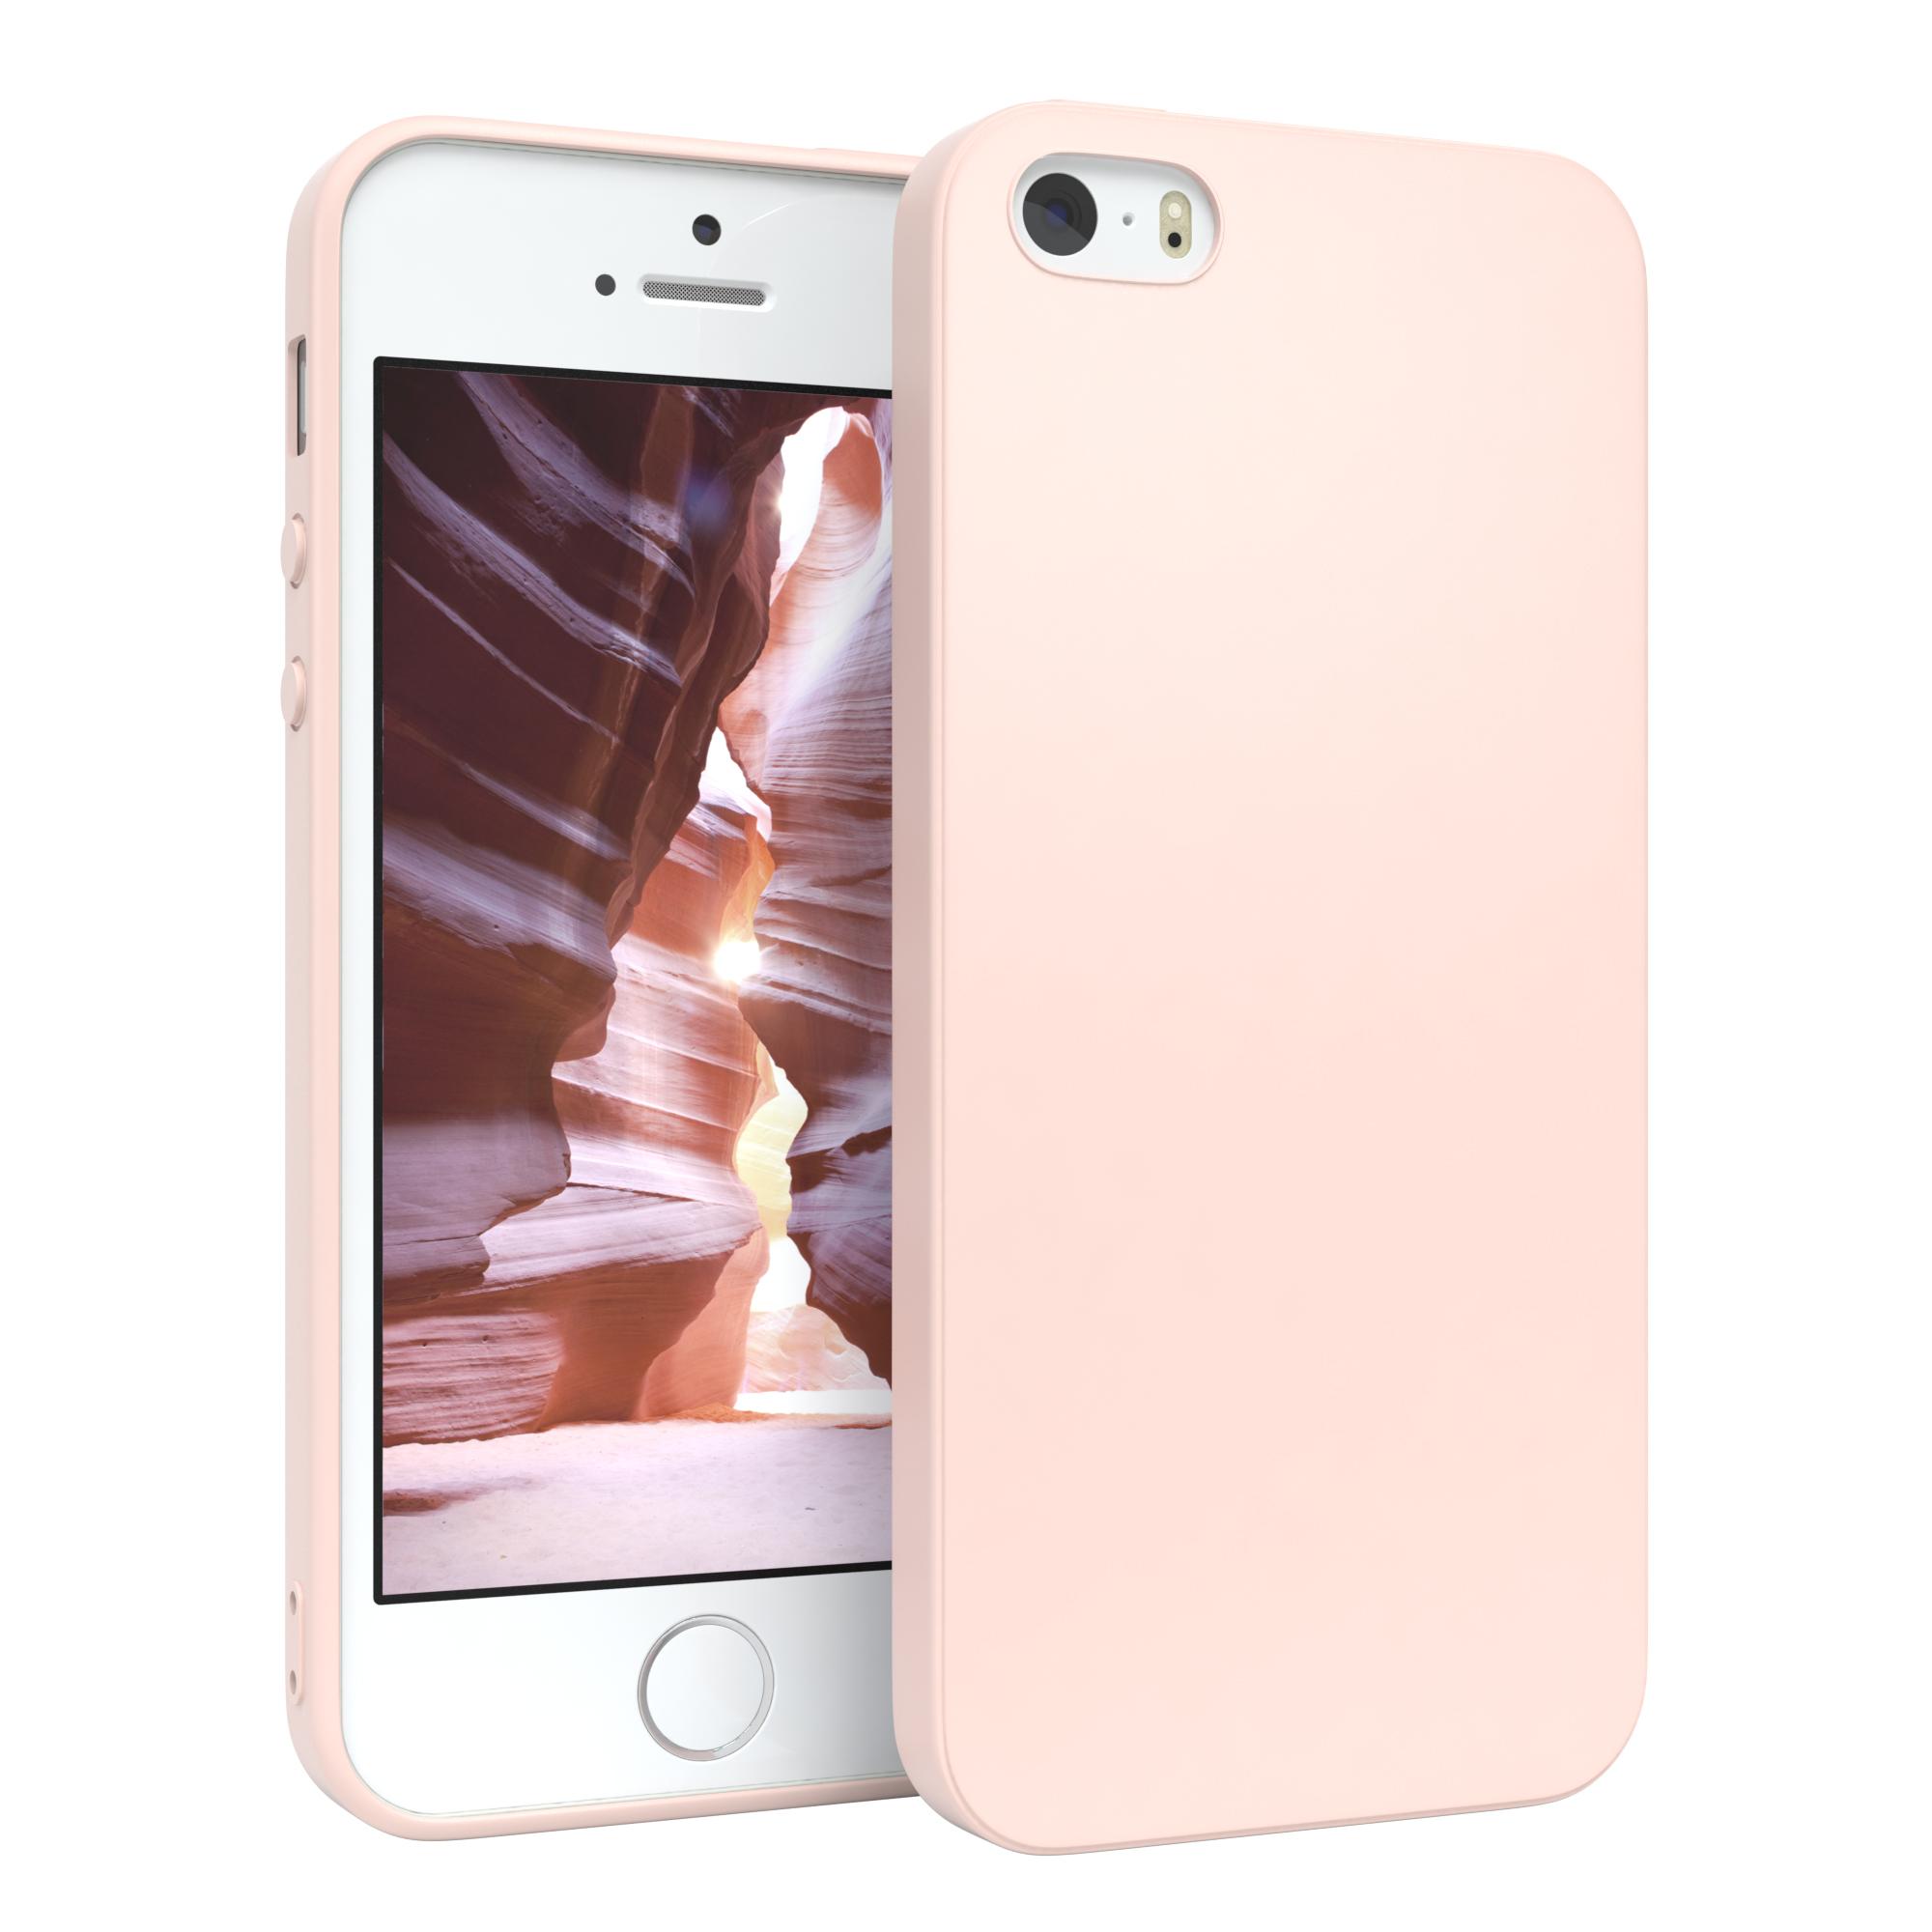 Handyhuelle-fuer-Apple-iPhone-SE-5-5S-Huelle-Tasche-Silikon-Backcover-Case-Cover Indexbild 10